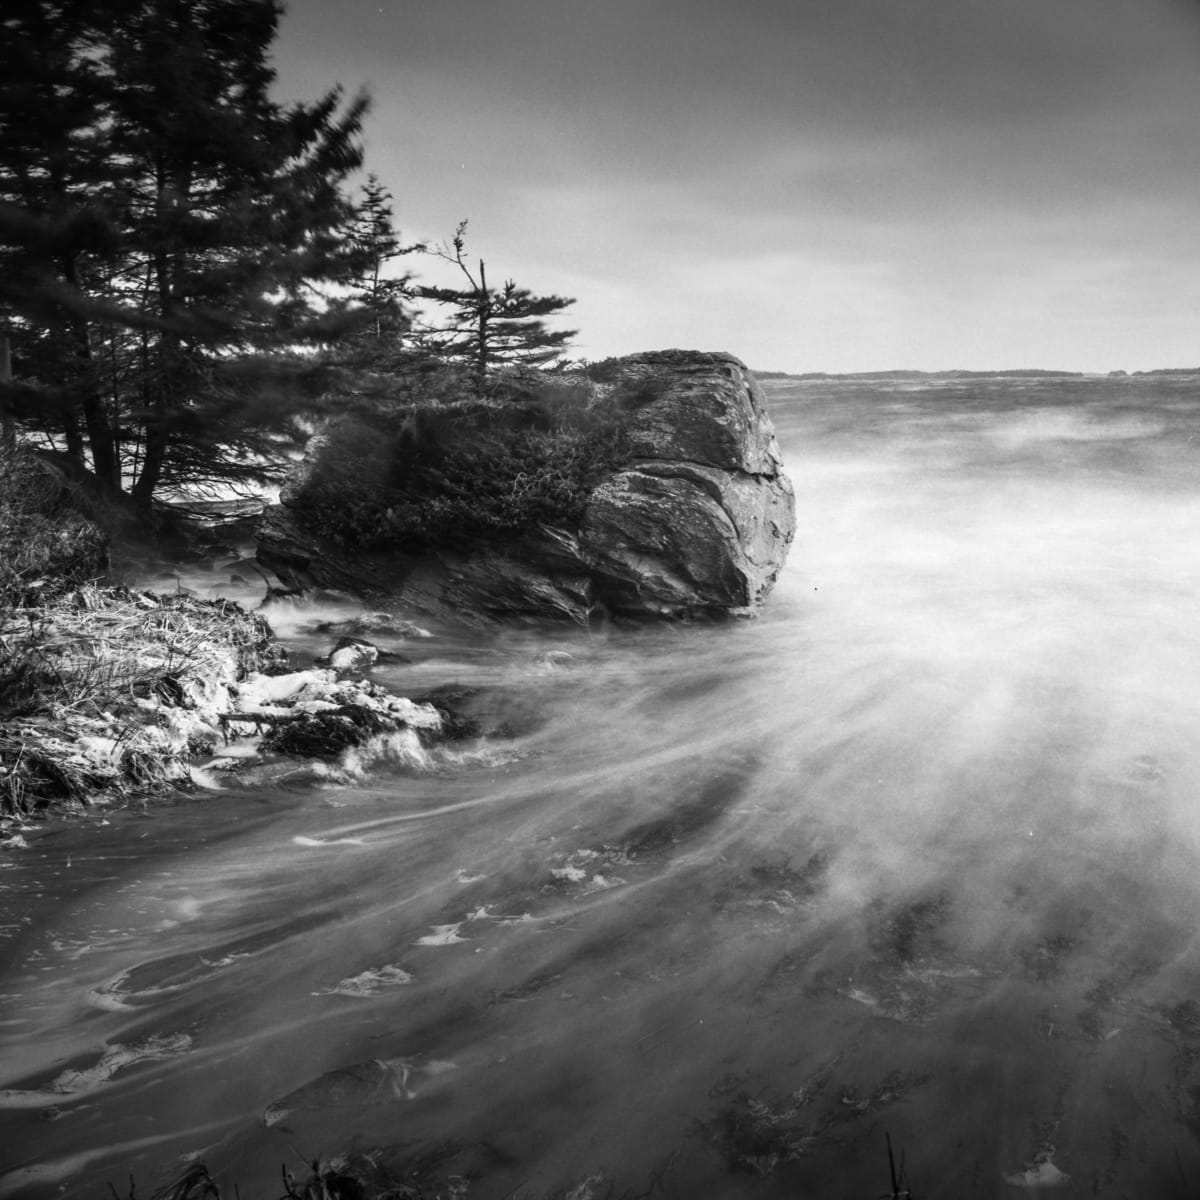 Hurricane, Taylor Head, Nova Scotia by Mark Brennan